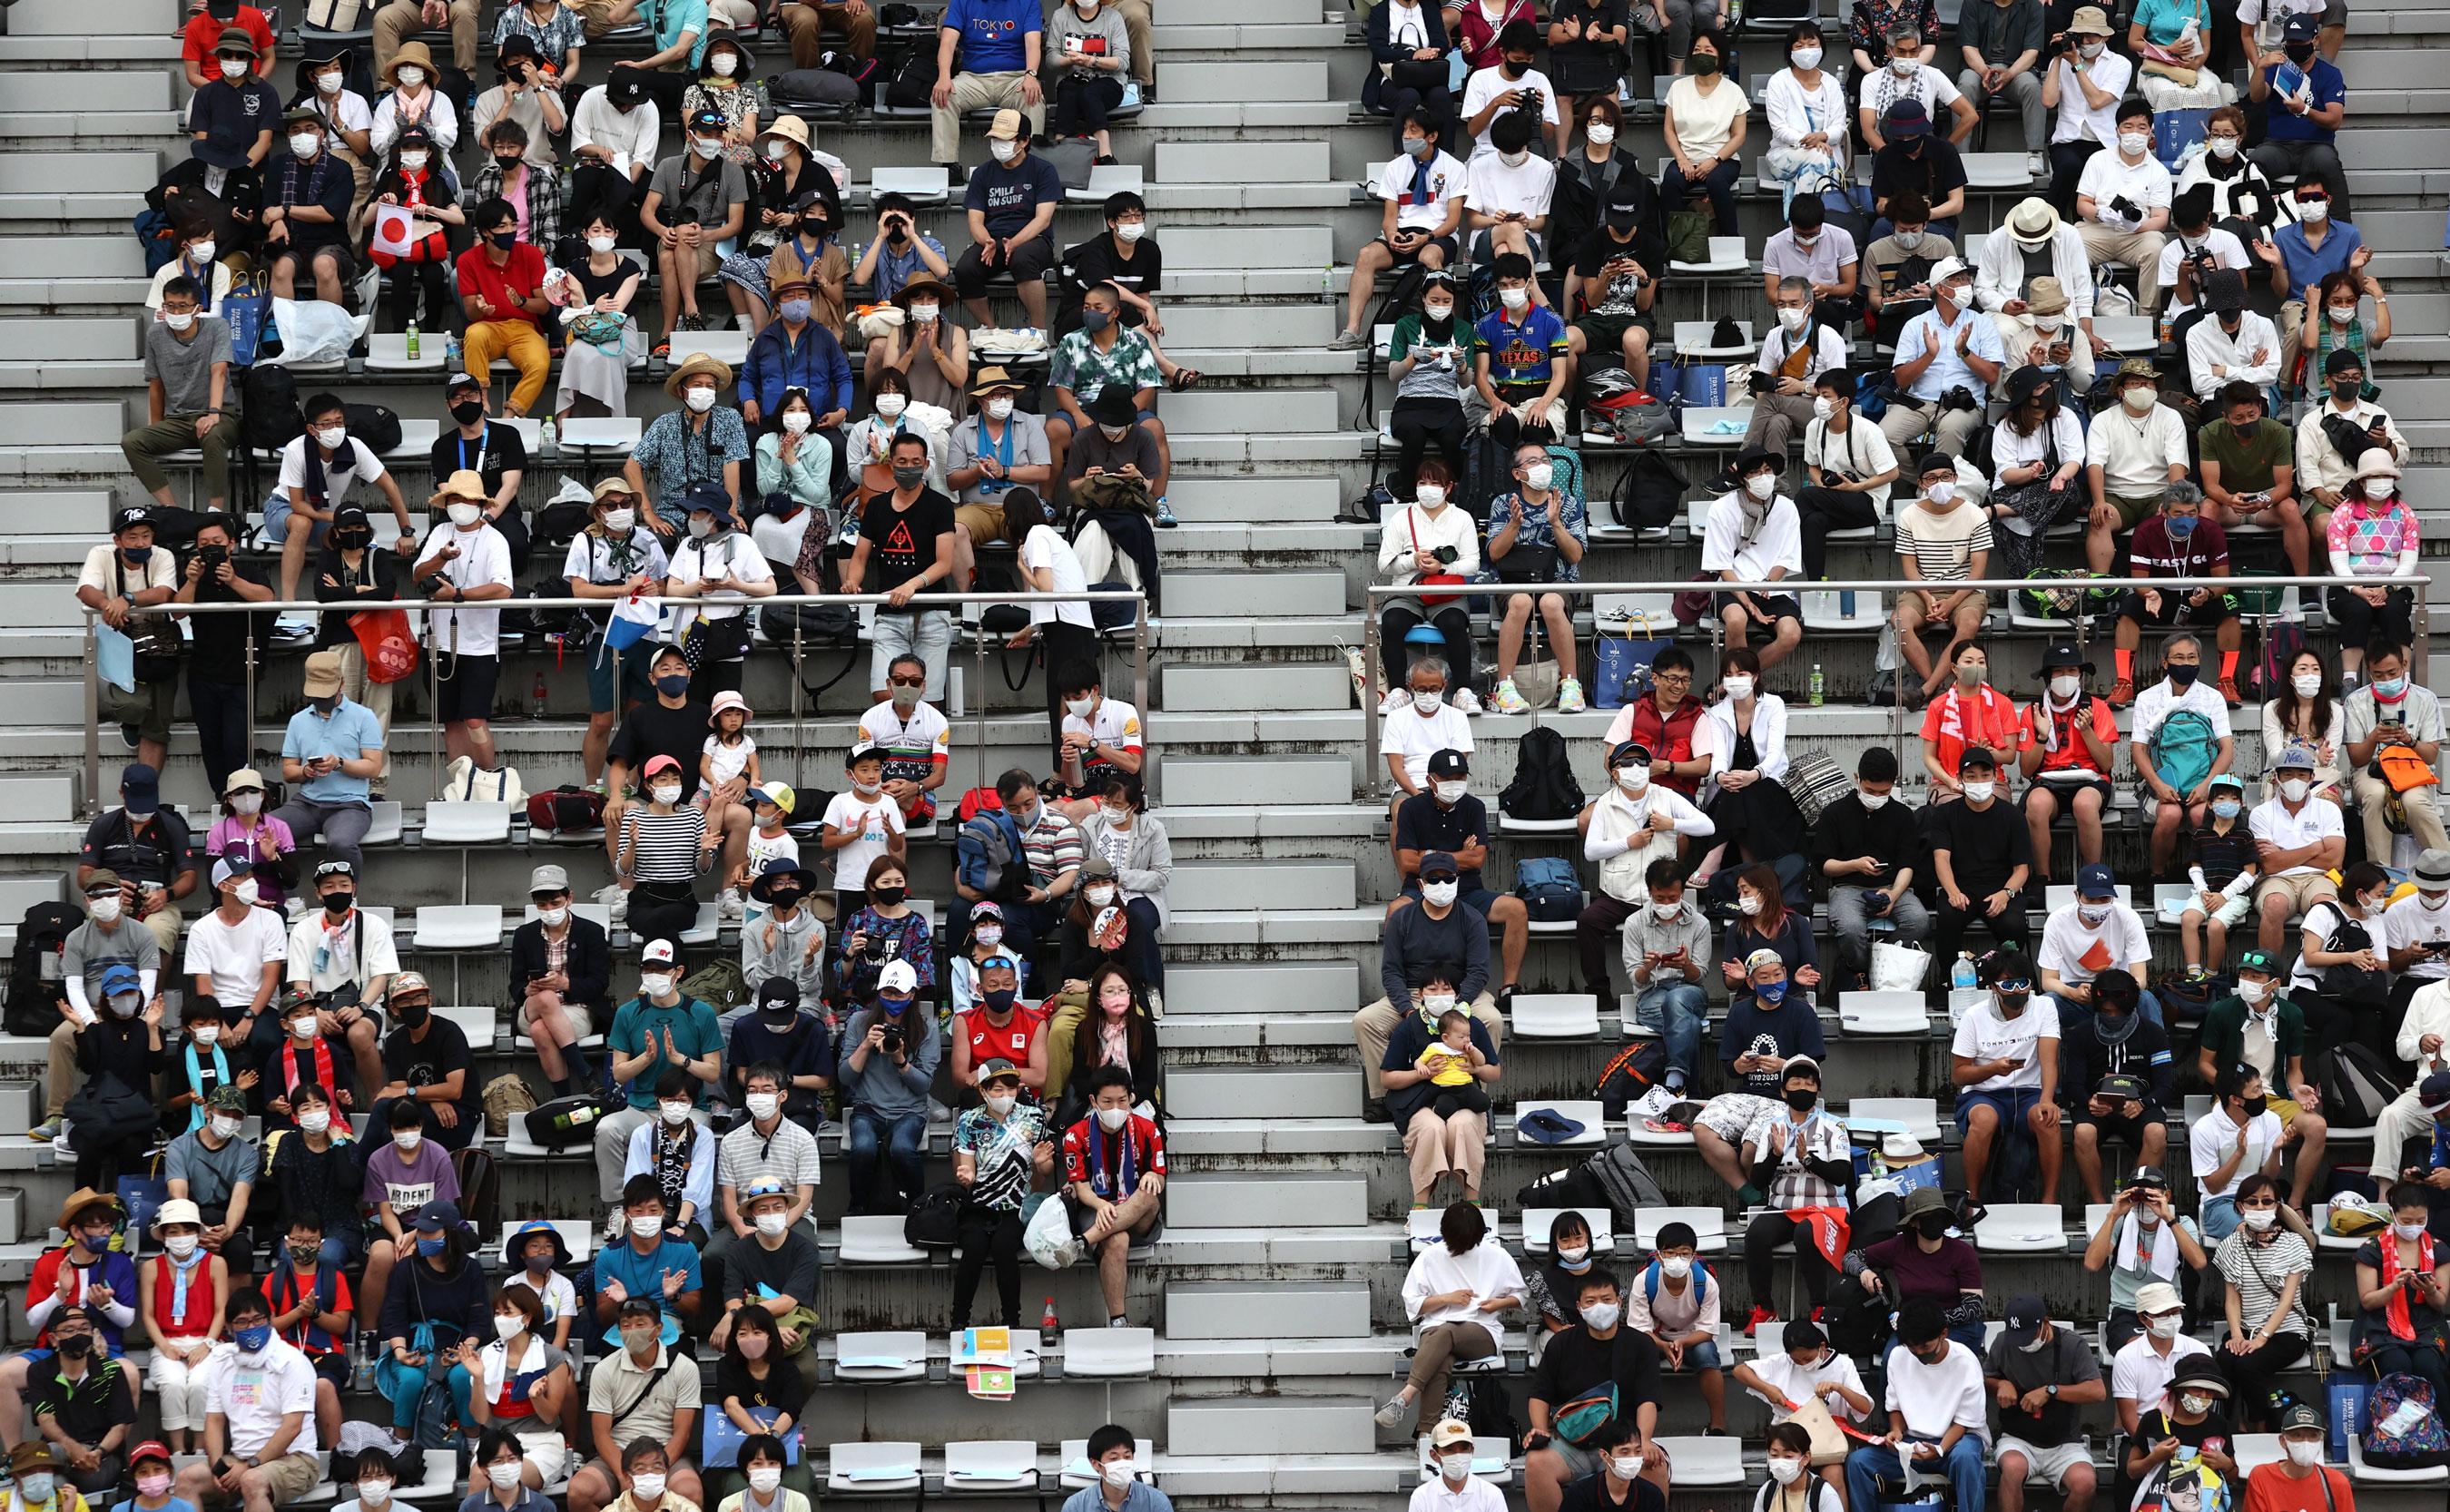 Fans watch the Men's road race at Fuji International Speedway.